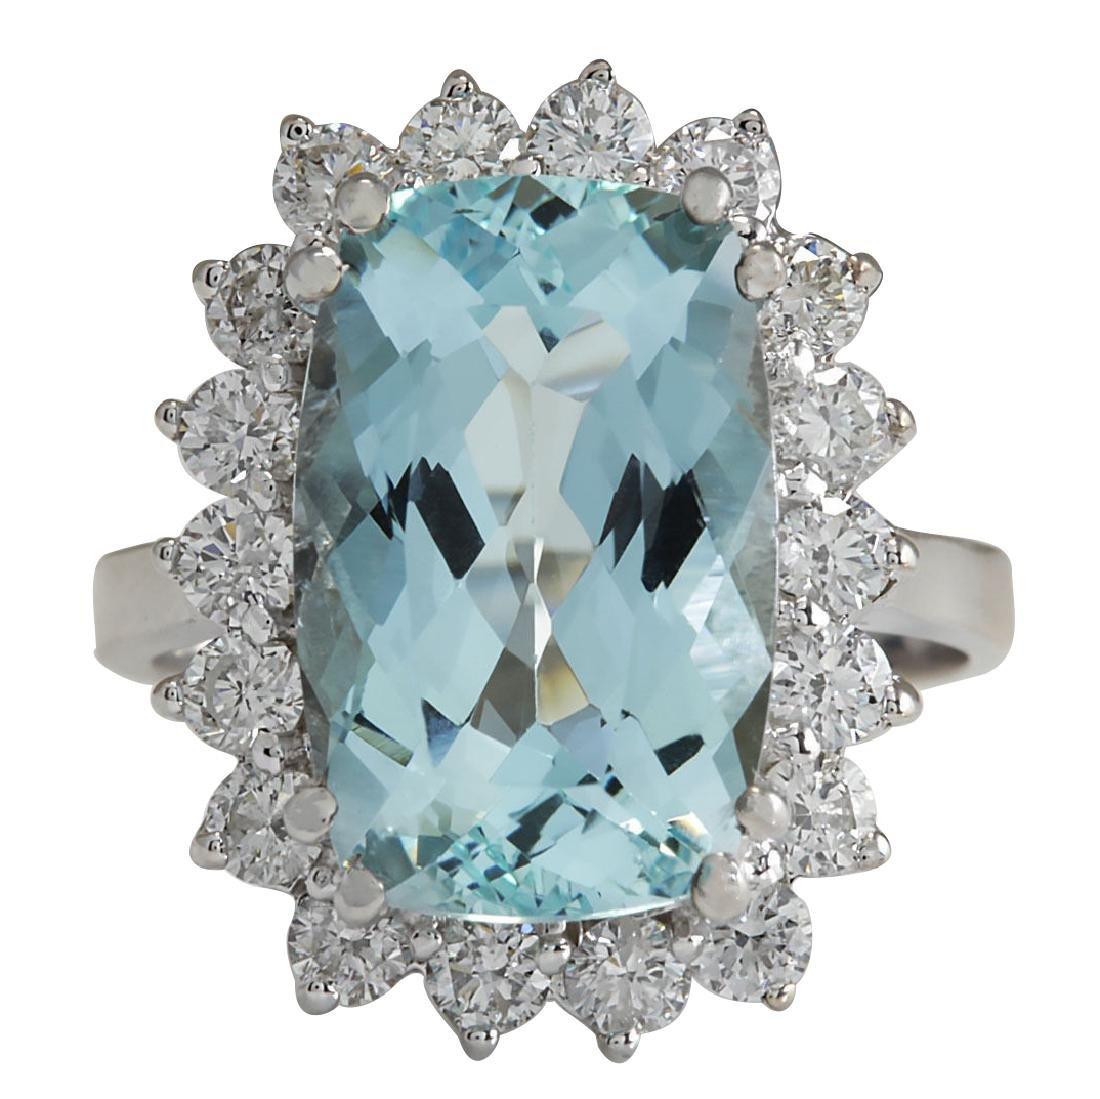 7.00CTW Natural Aquamarine And Diamond Ring In 18K